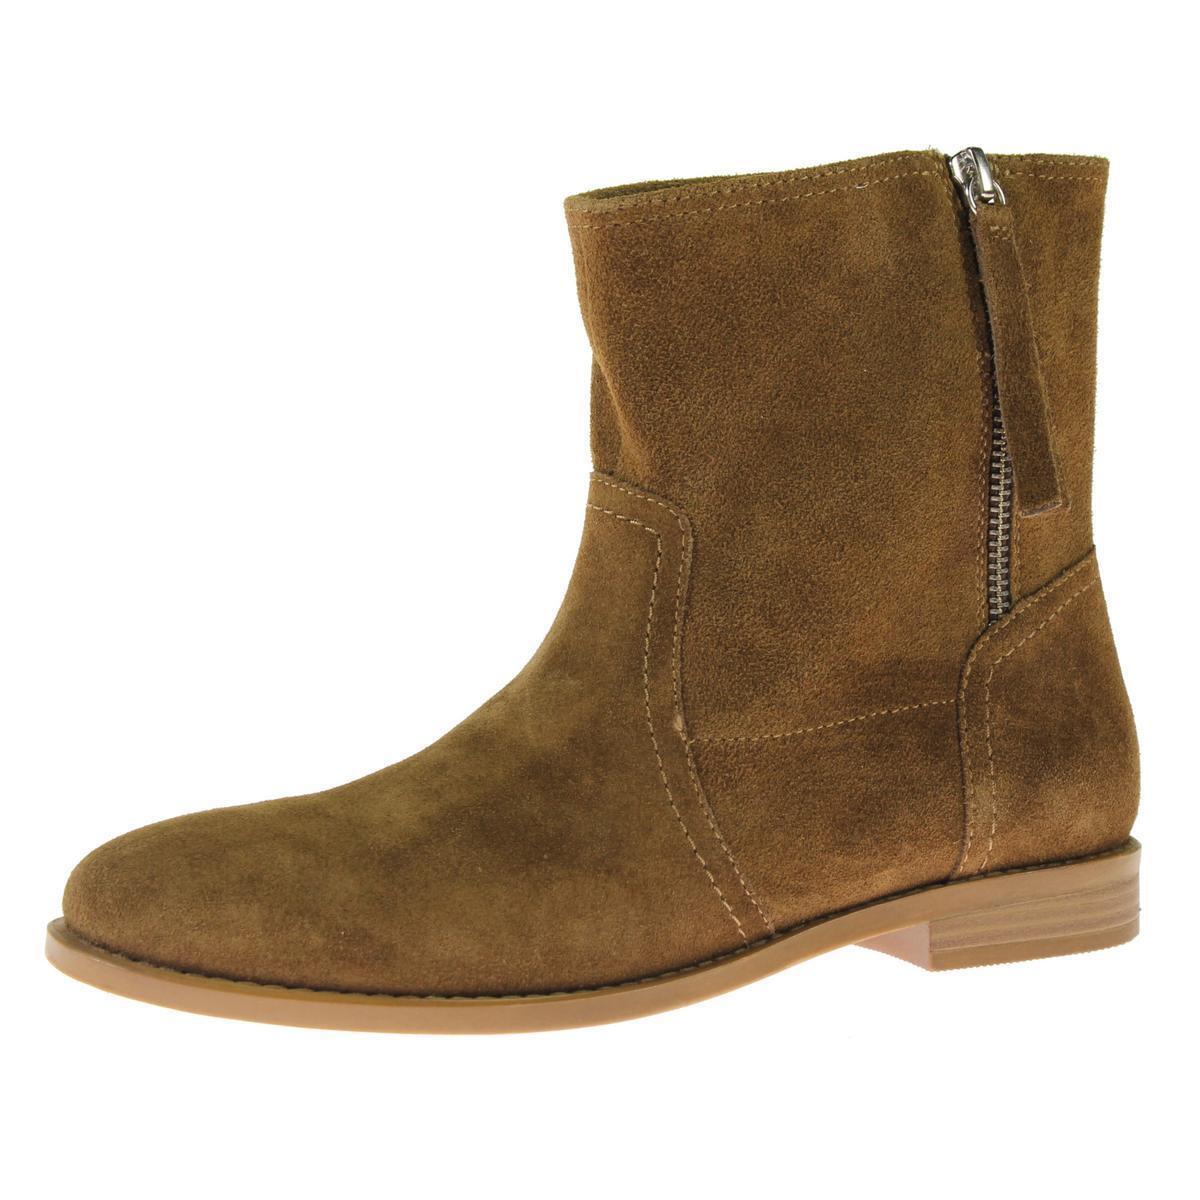 NIB Steve Madden Womens Constant Suede Round Toe Zipper Ankle Boots Cognac 5.5